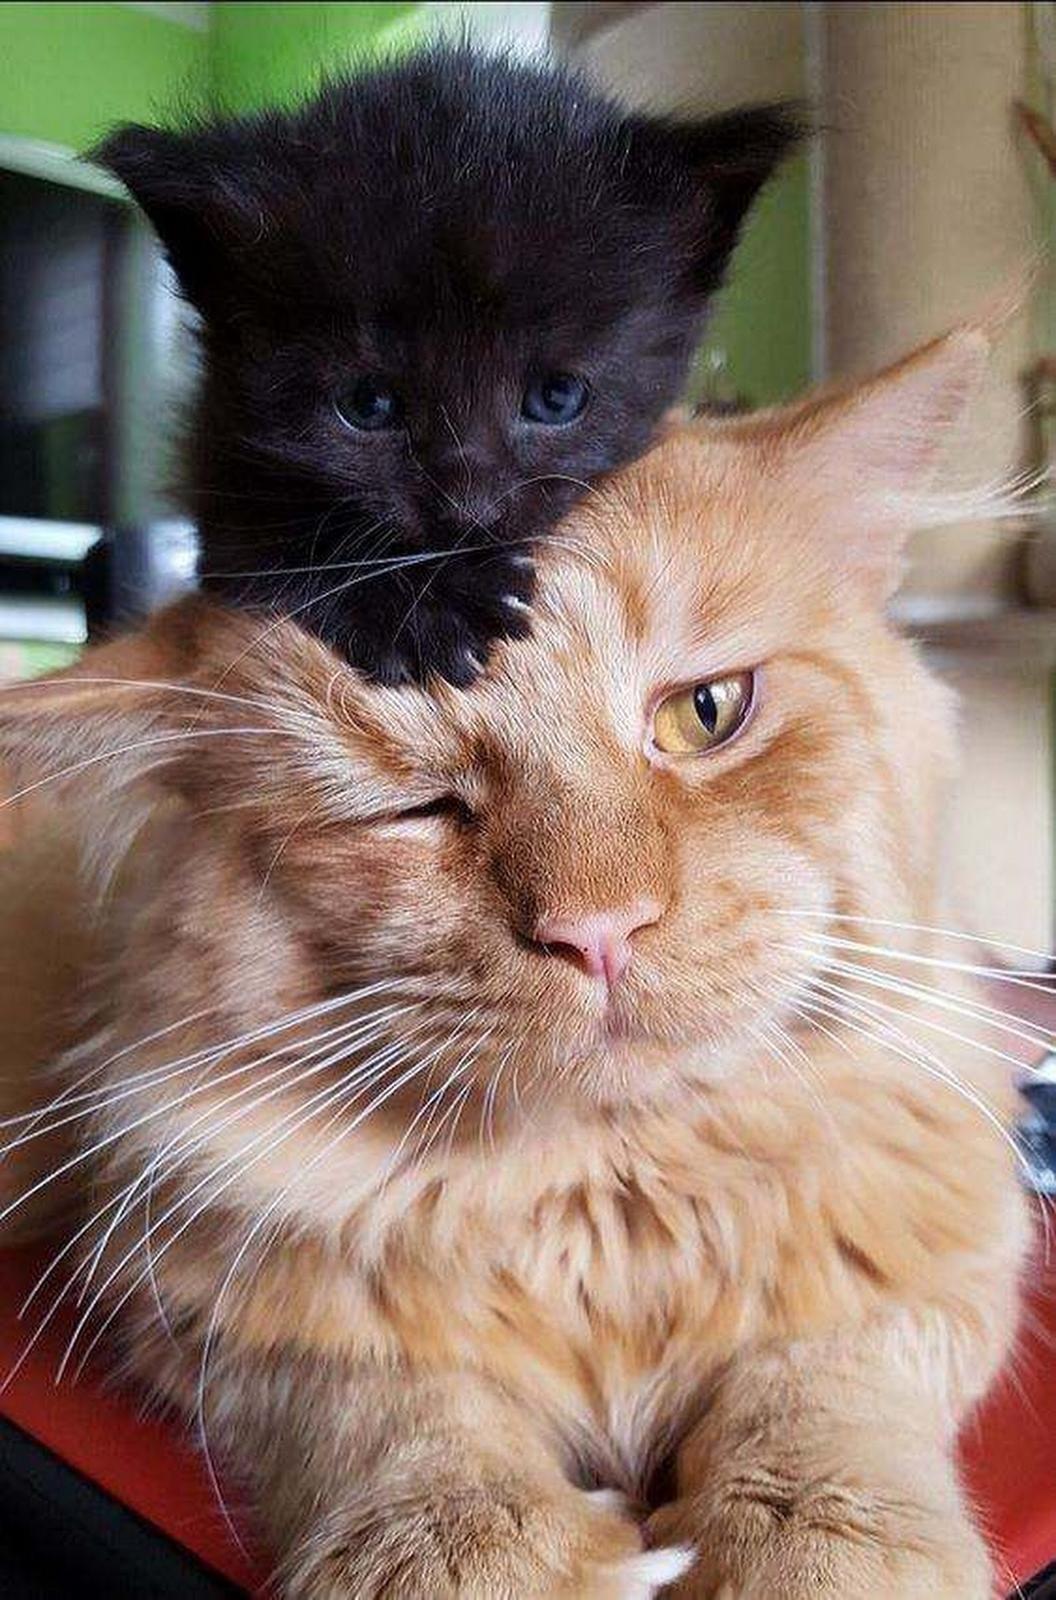 Pin By Sharron Cadogan On Cuteness Cute Cats Cute Cat Gif Cute Animals